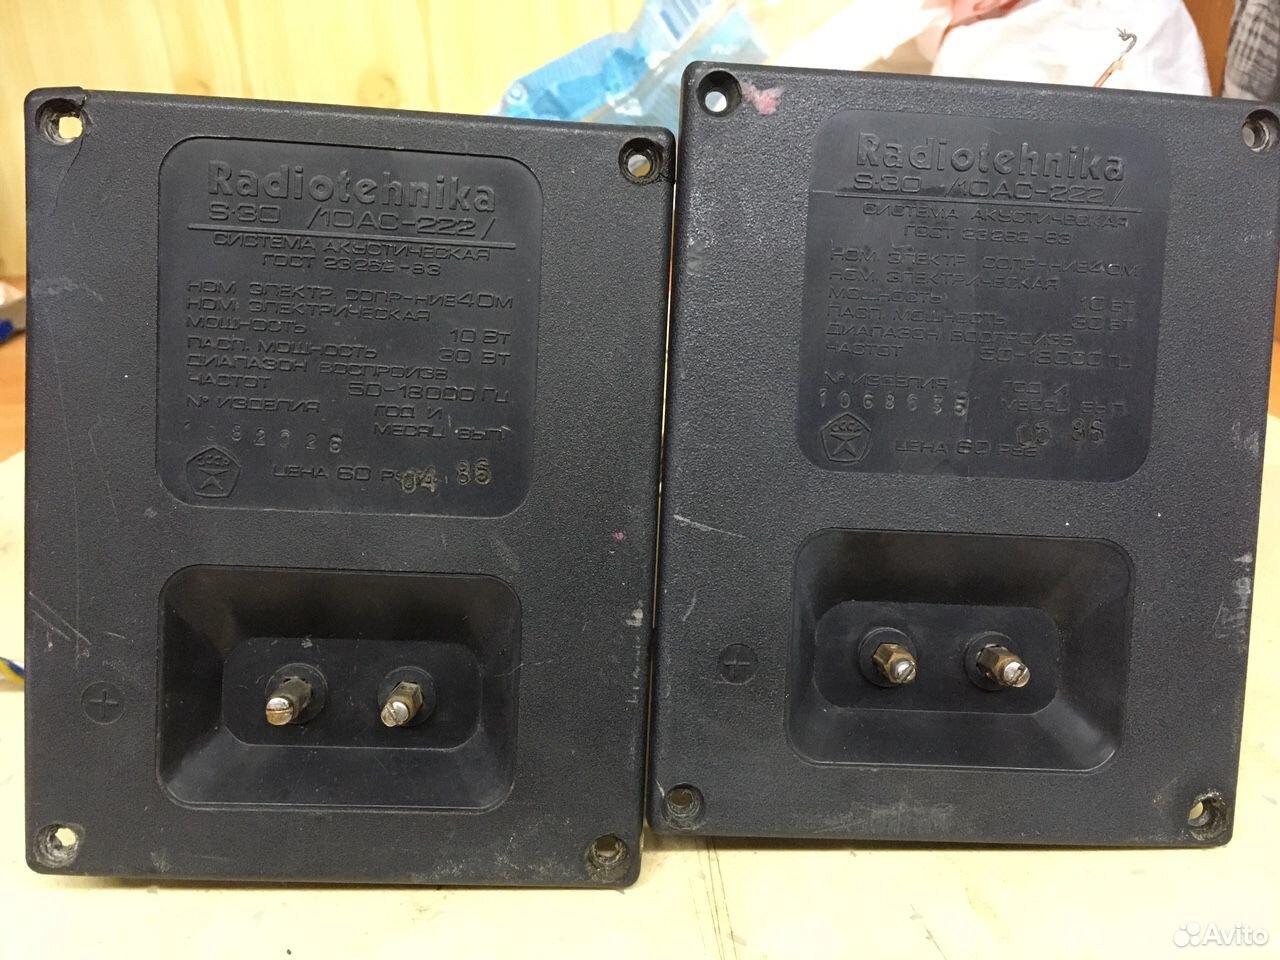 Фильтра Radiotehnika S-30, радиотехника s-30  89321112222 купить 1